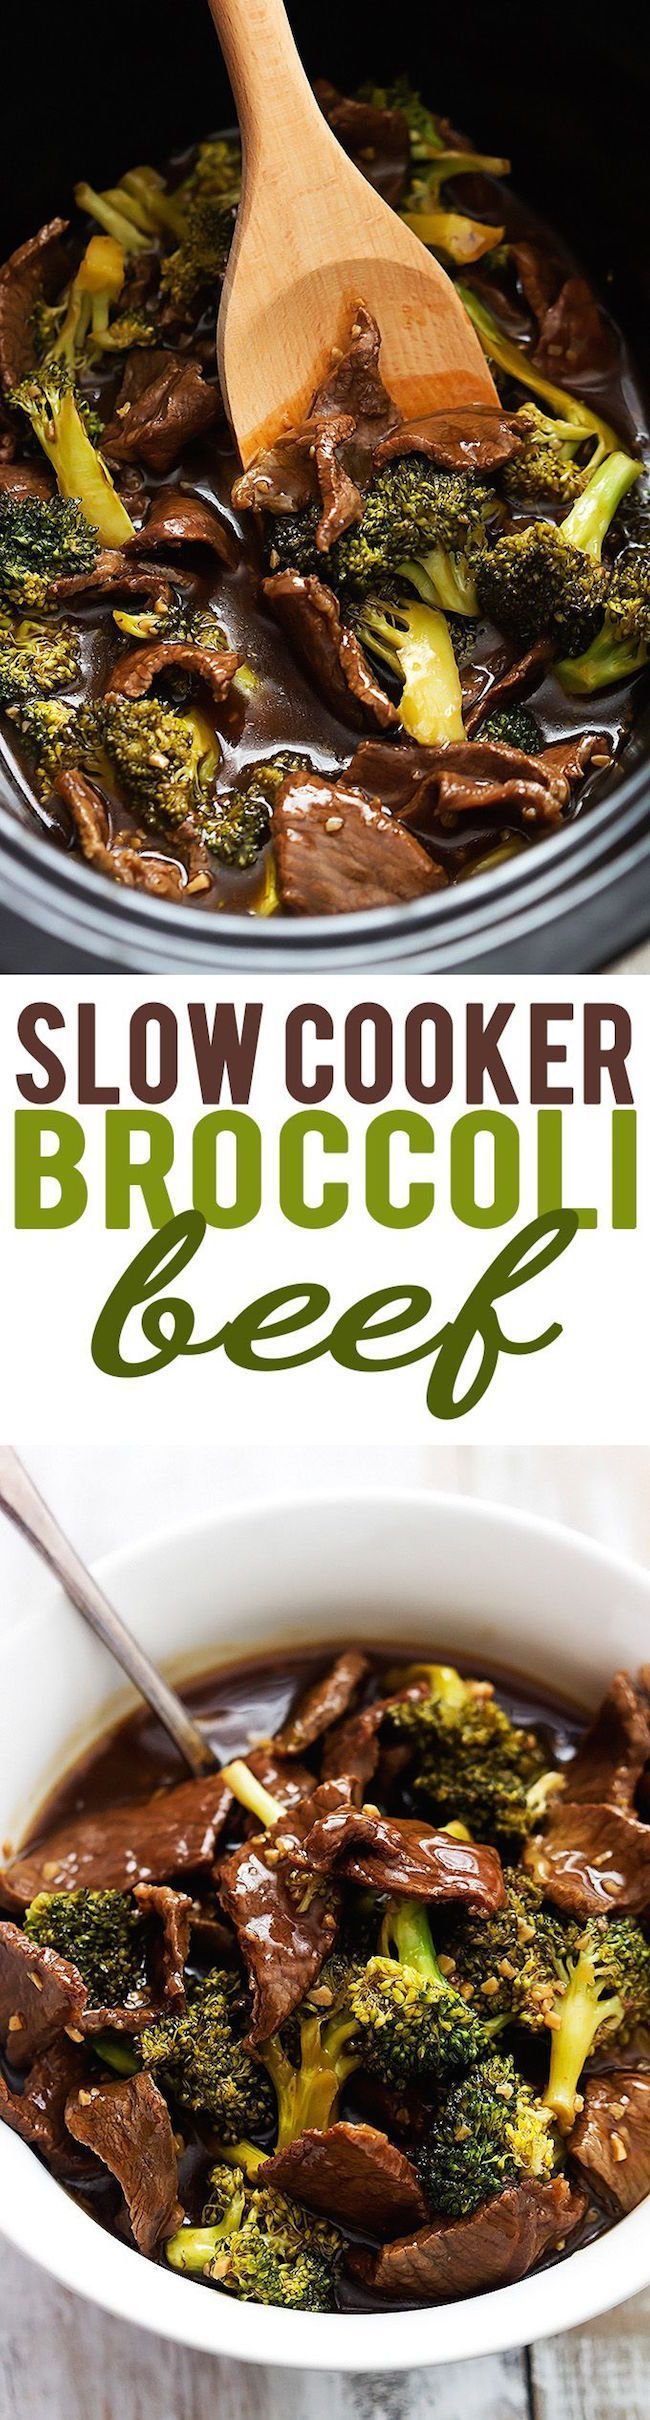 Slow Cooker Broccoli Beef...use stew seasoning packet instead of listed seasoning